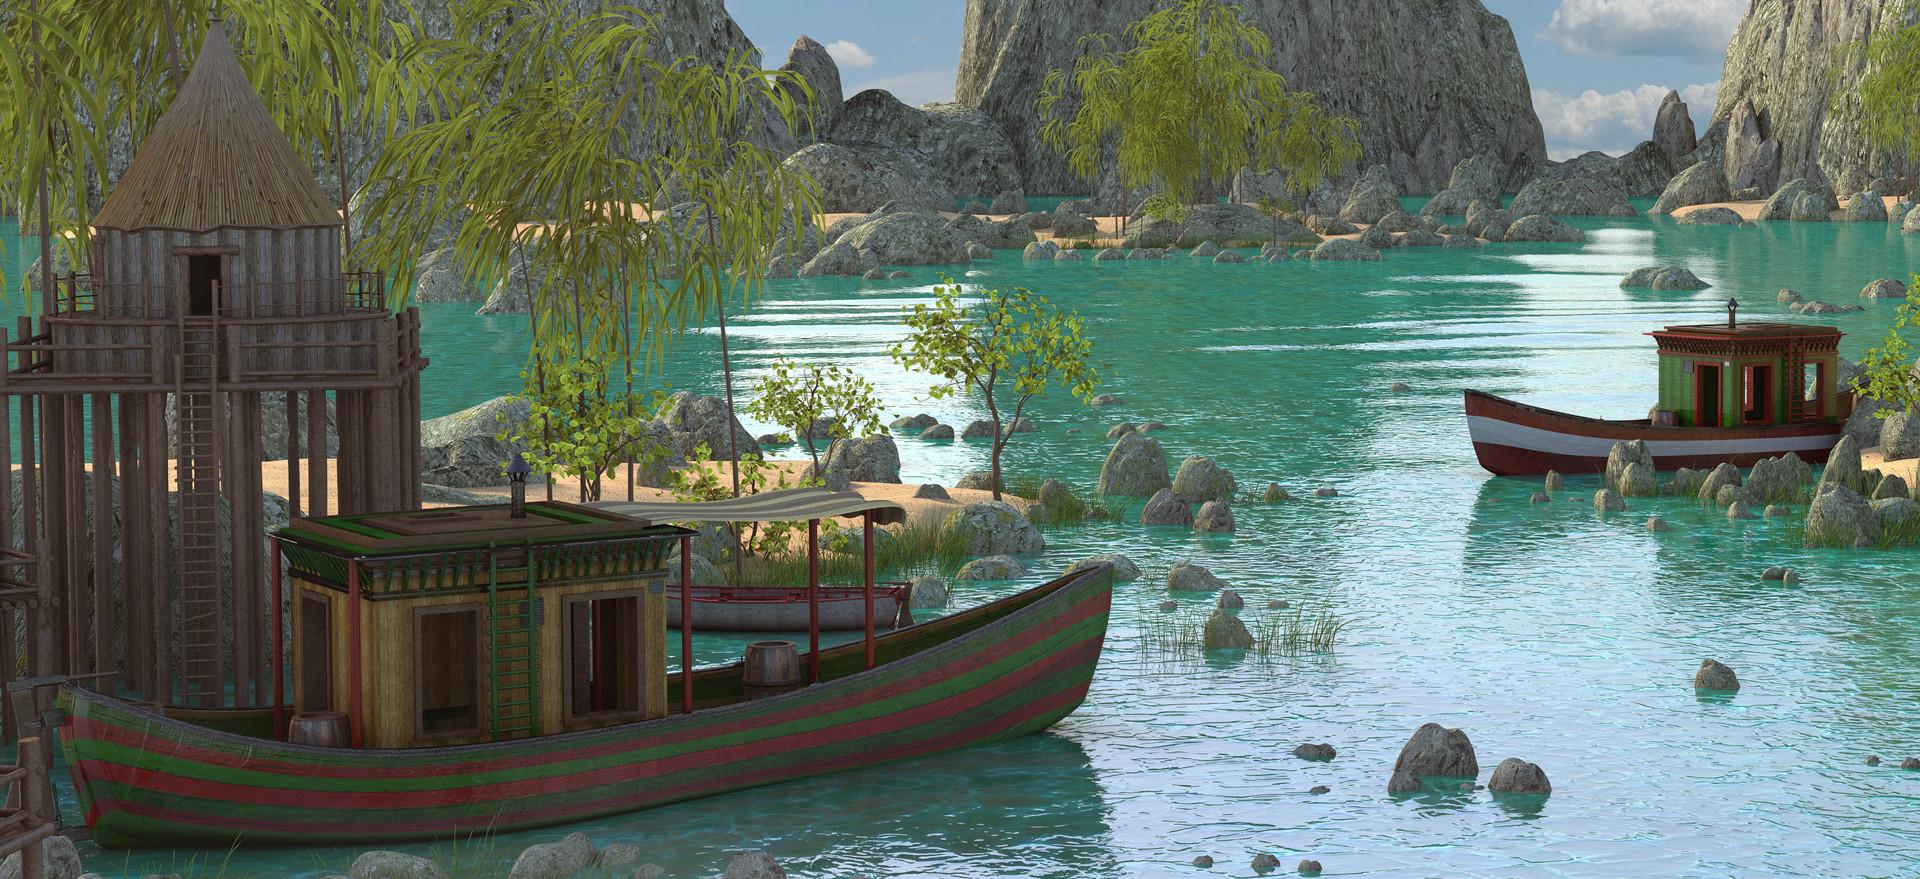 Marc mons vietnam6